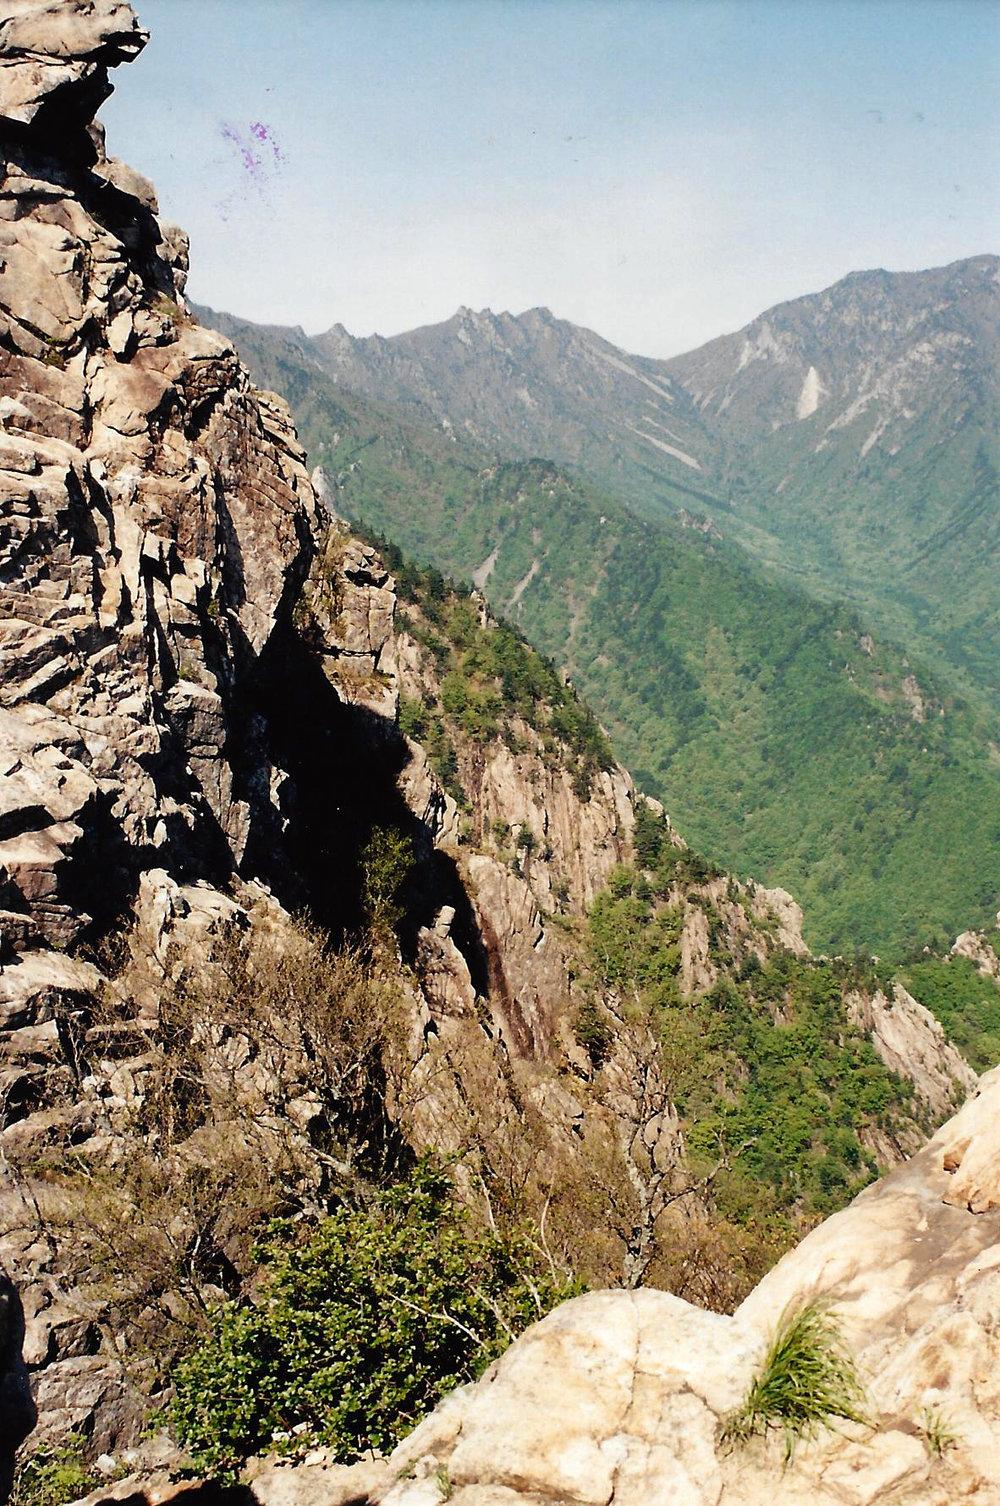 Image-11-South-Korea-The-Sorak-National-Park-1.jpg